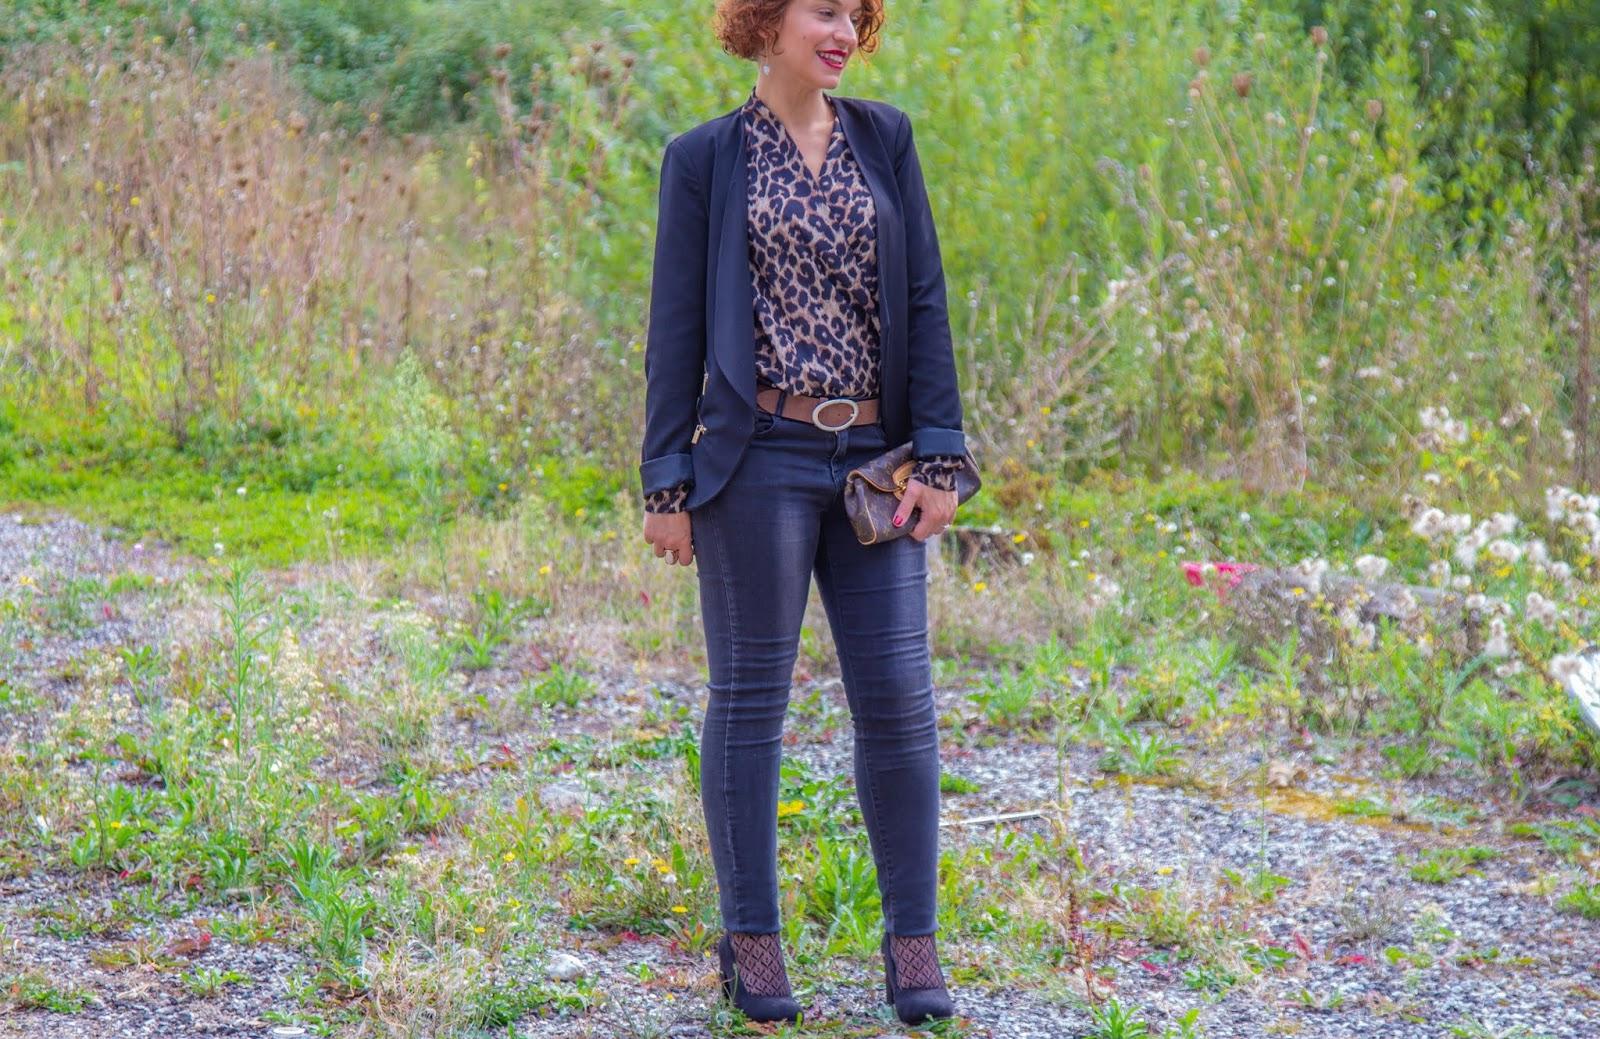 look - body - leopard - new - look